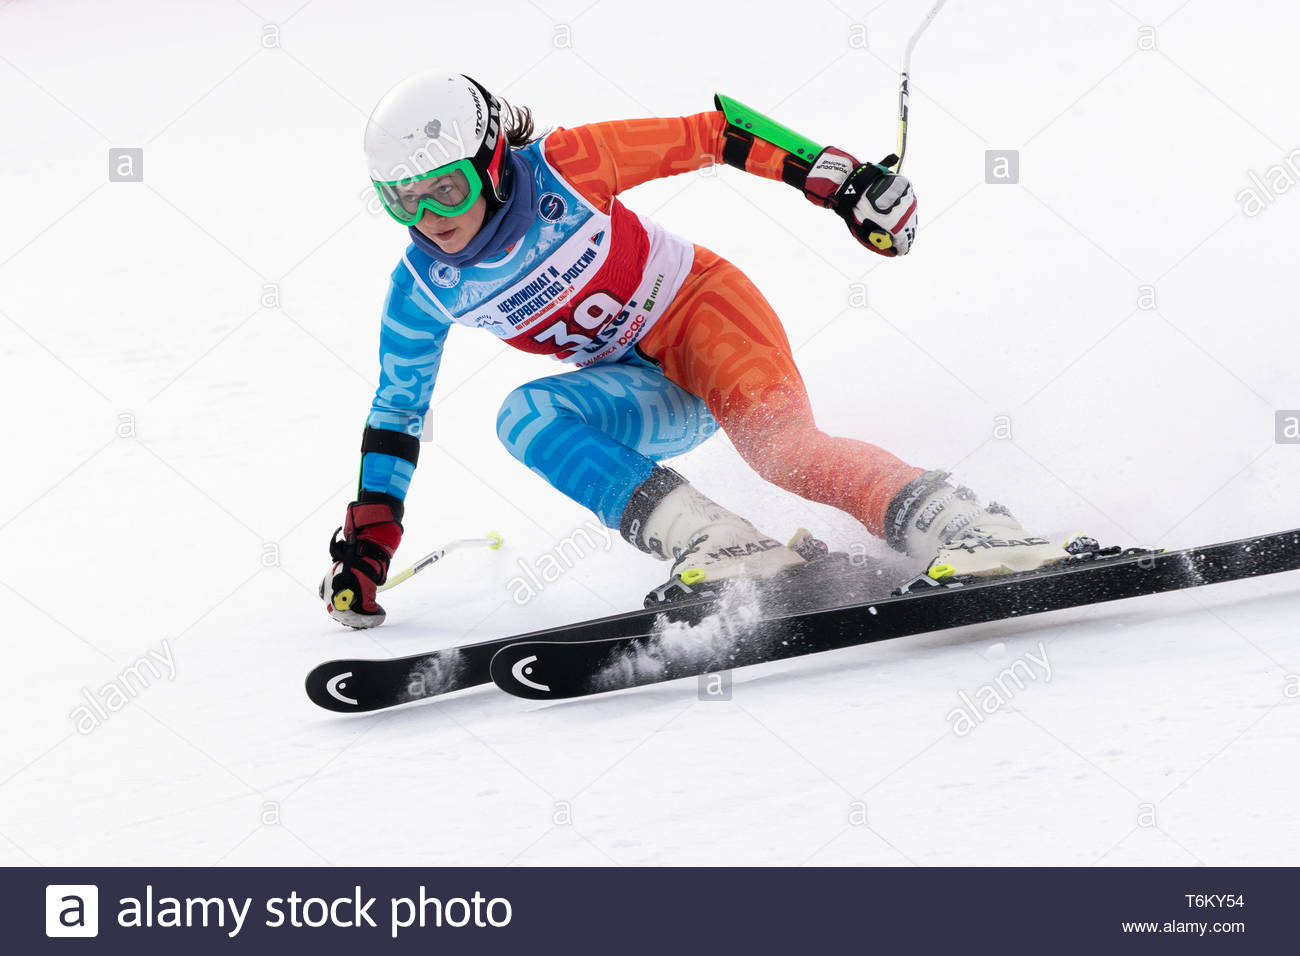 KAMCHATKA PENINSULA, RUSSIA - APR 2, 2019: Mountain skier Victoria Fugleva (Sakhalin Region) skiing down mount. Russian Women's Alpine Skiing Cup Inte - Stock Image